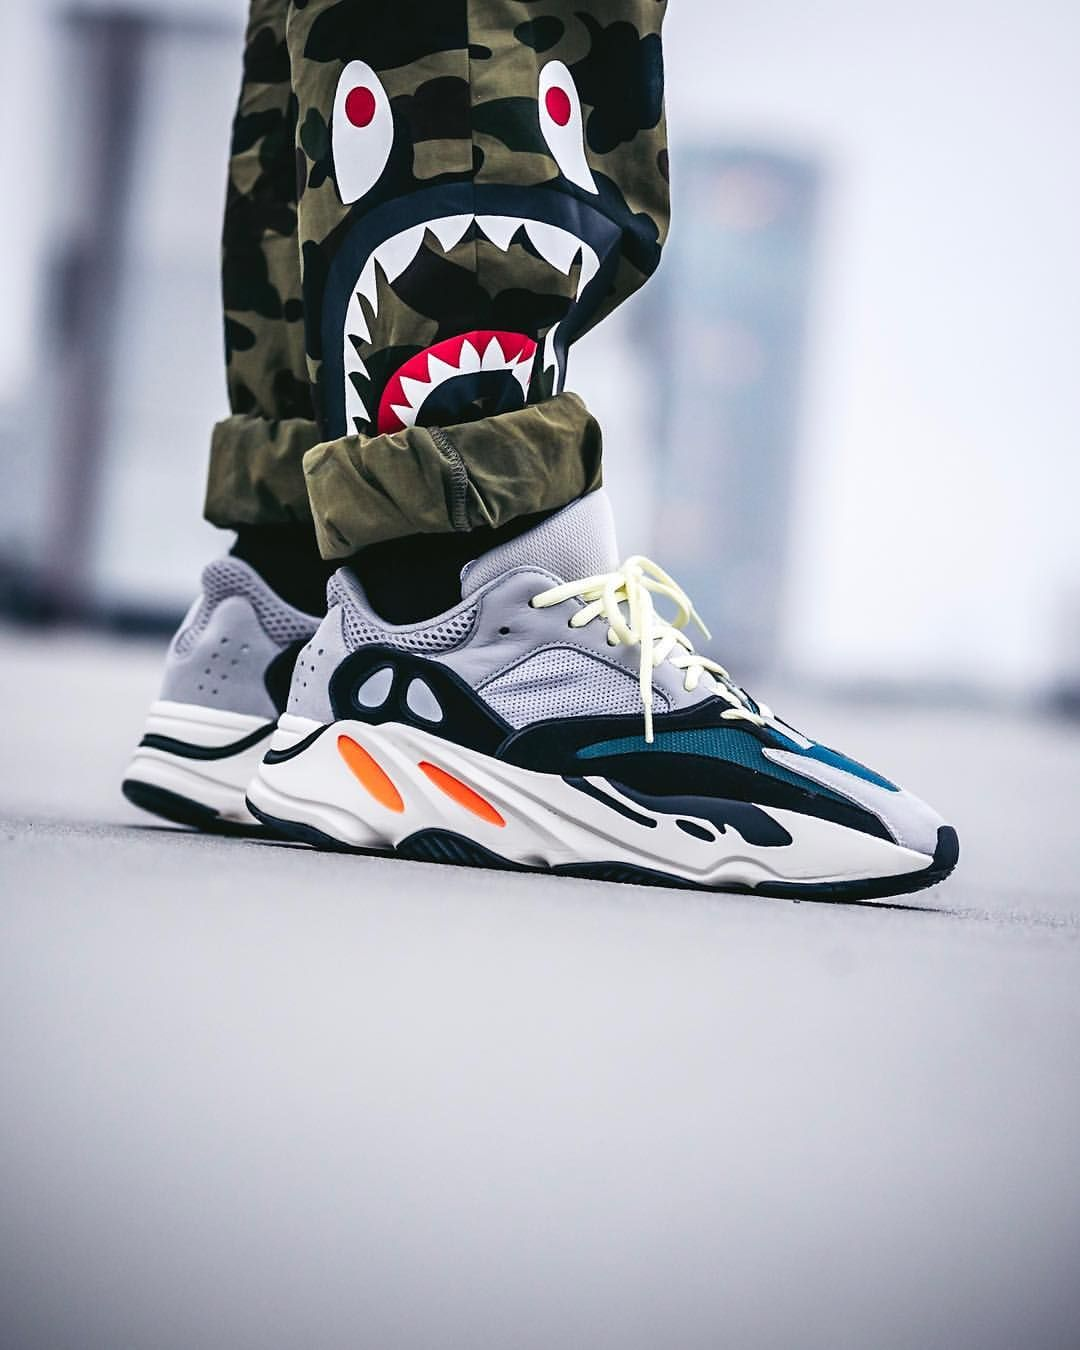 c018c5c34c644 adidas Yeezy Wave Runner